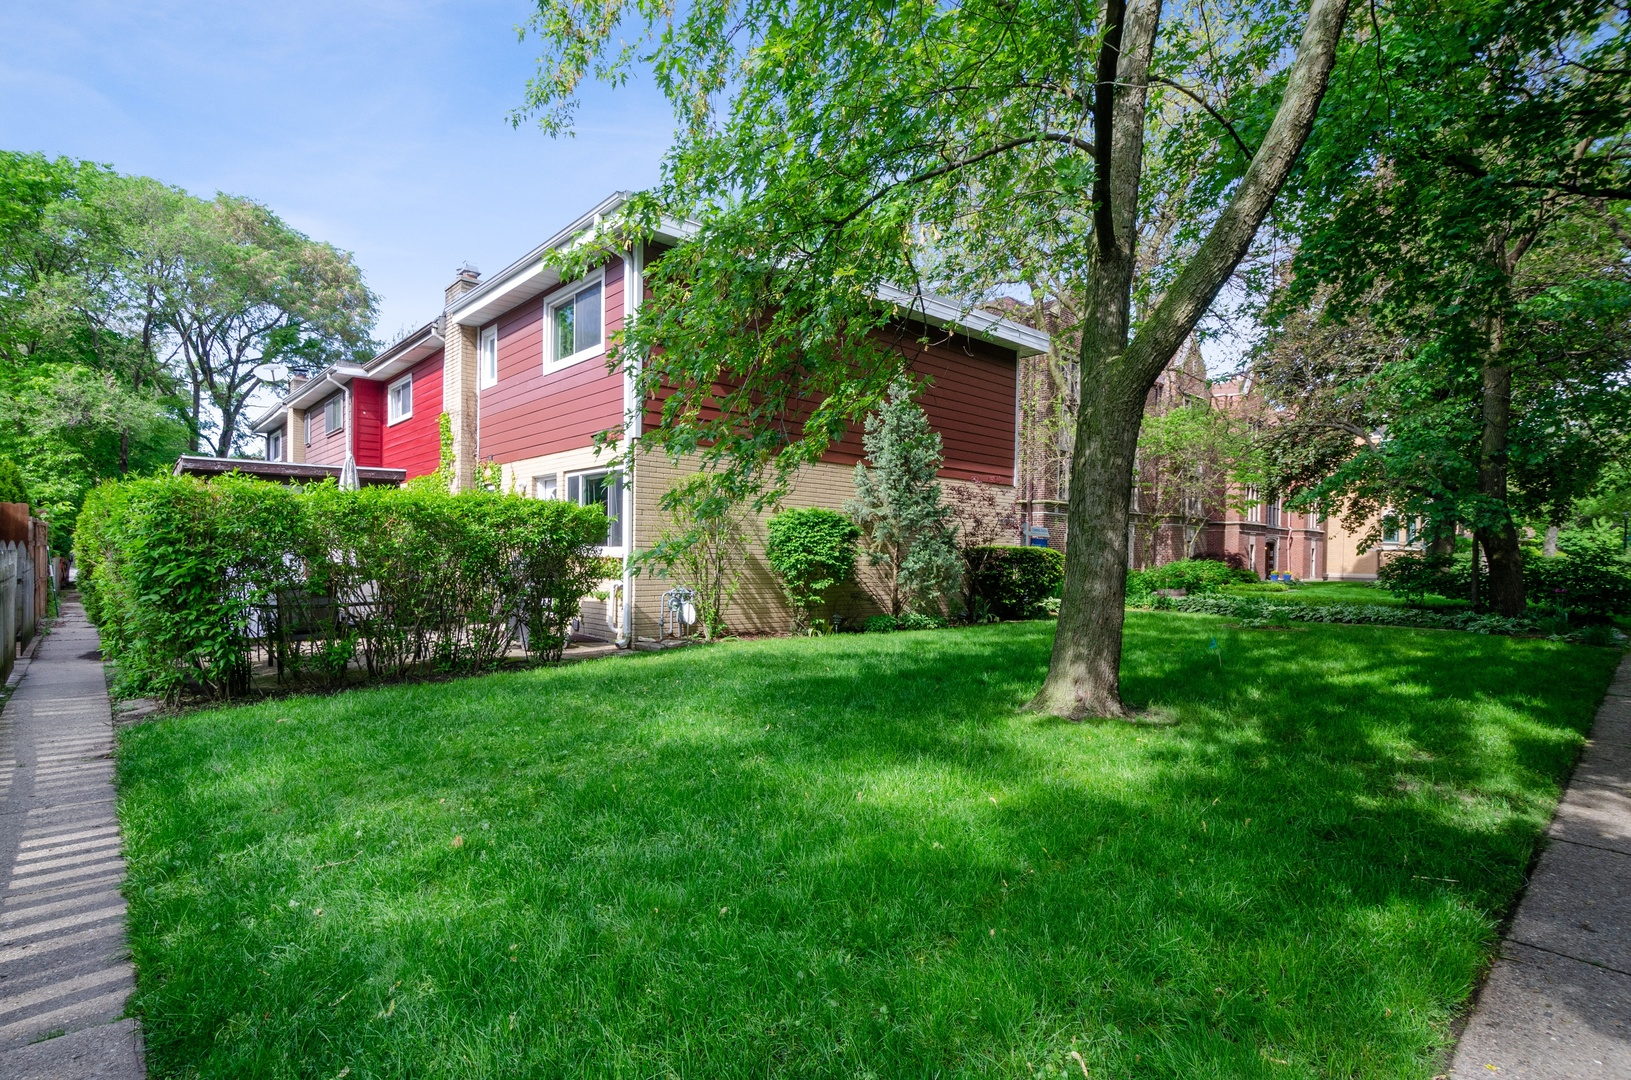 1217 Mulford 1, EVANSTON, Illinois, 60202